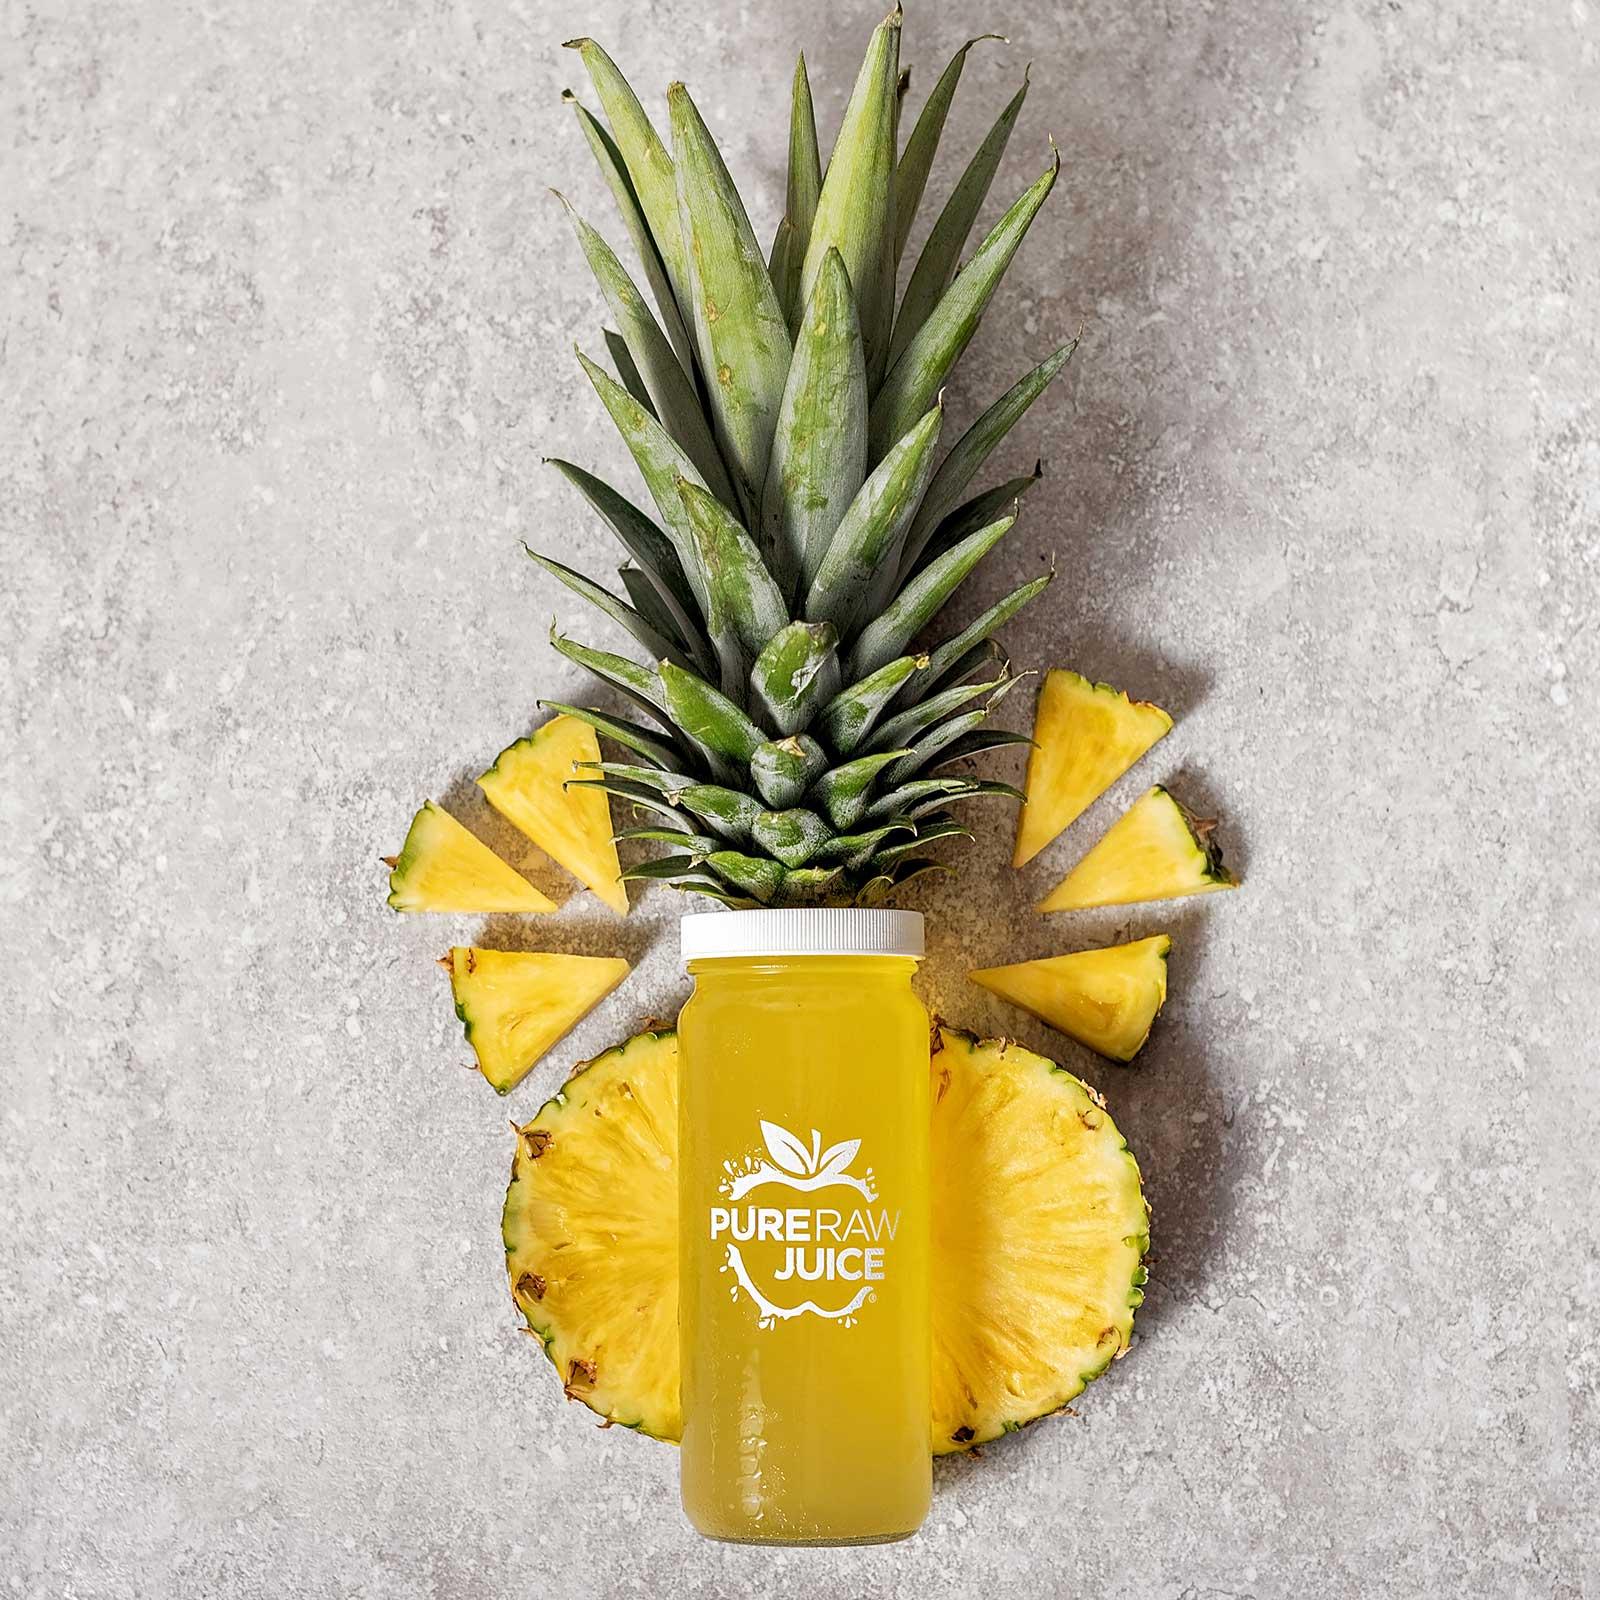 PRJ_ColdPressedJuice_Pineapple_Sq_WEB